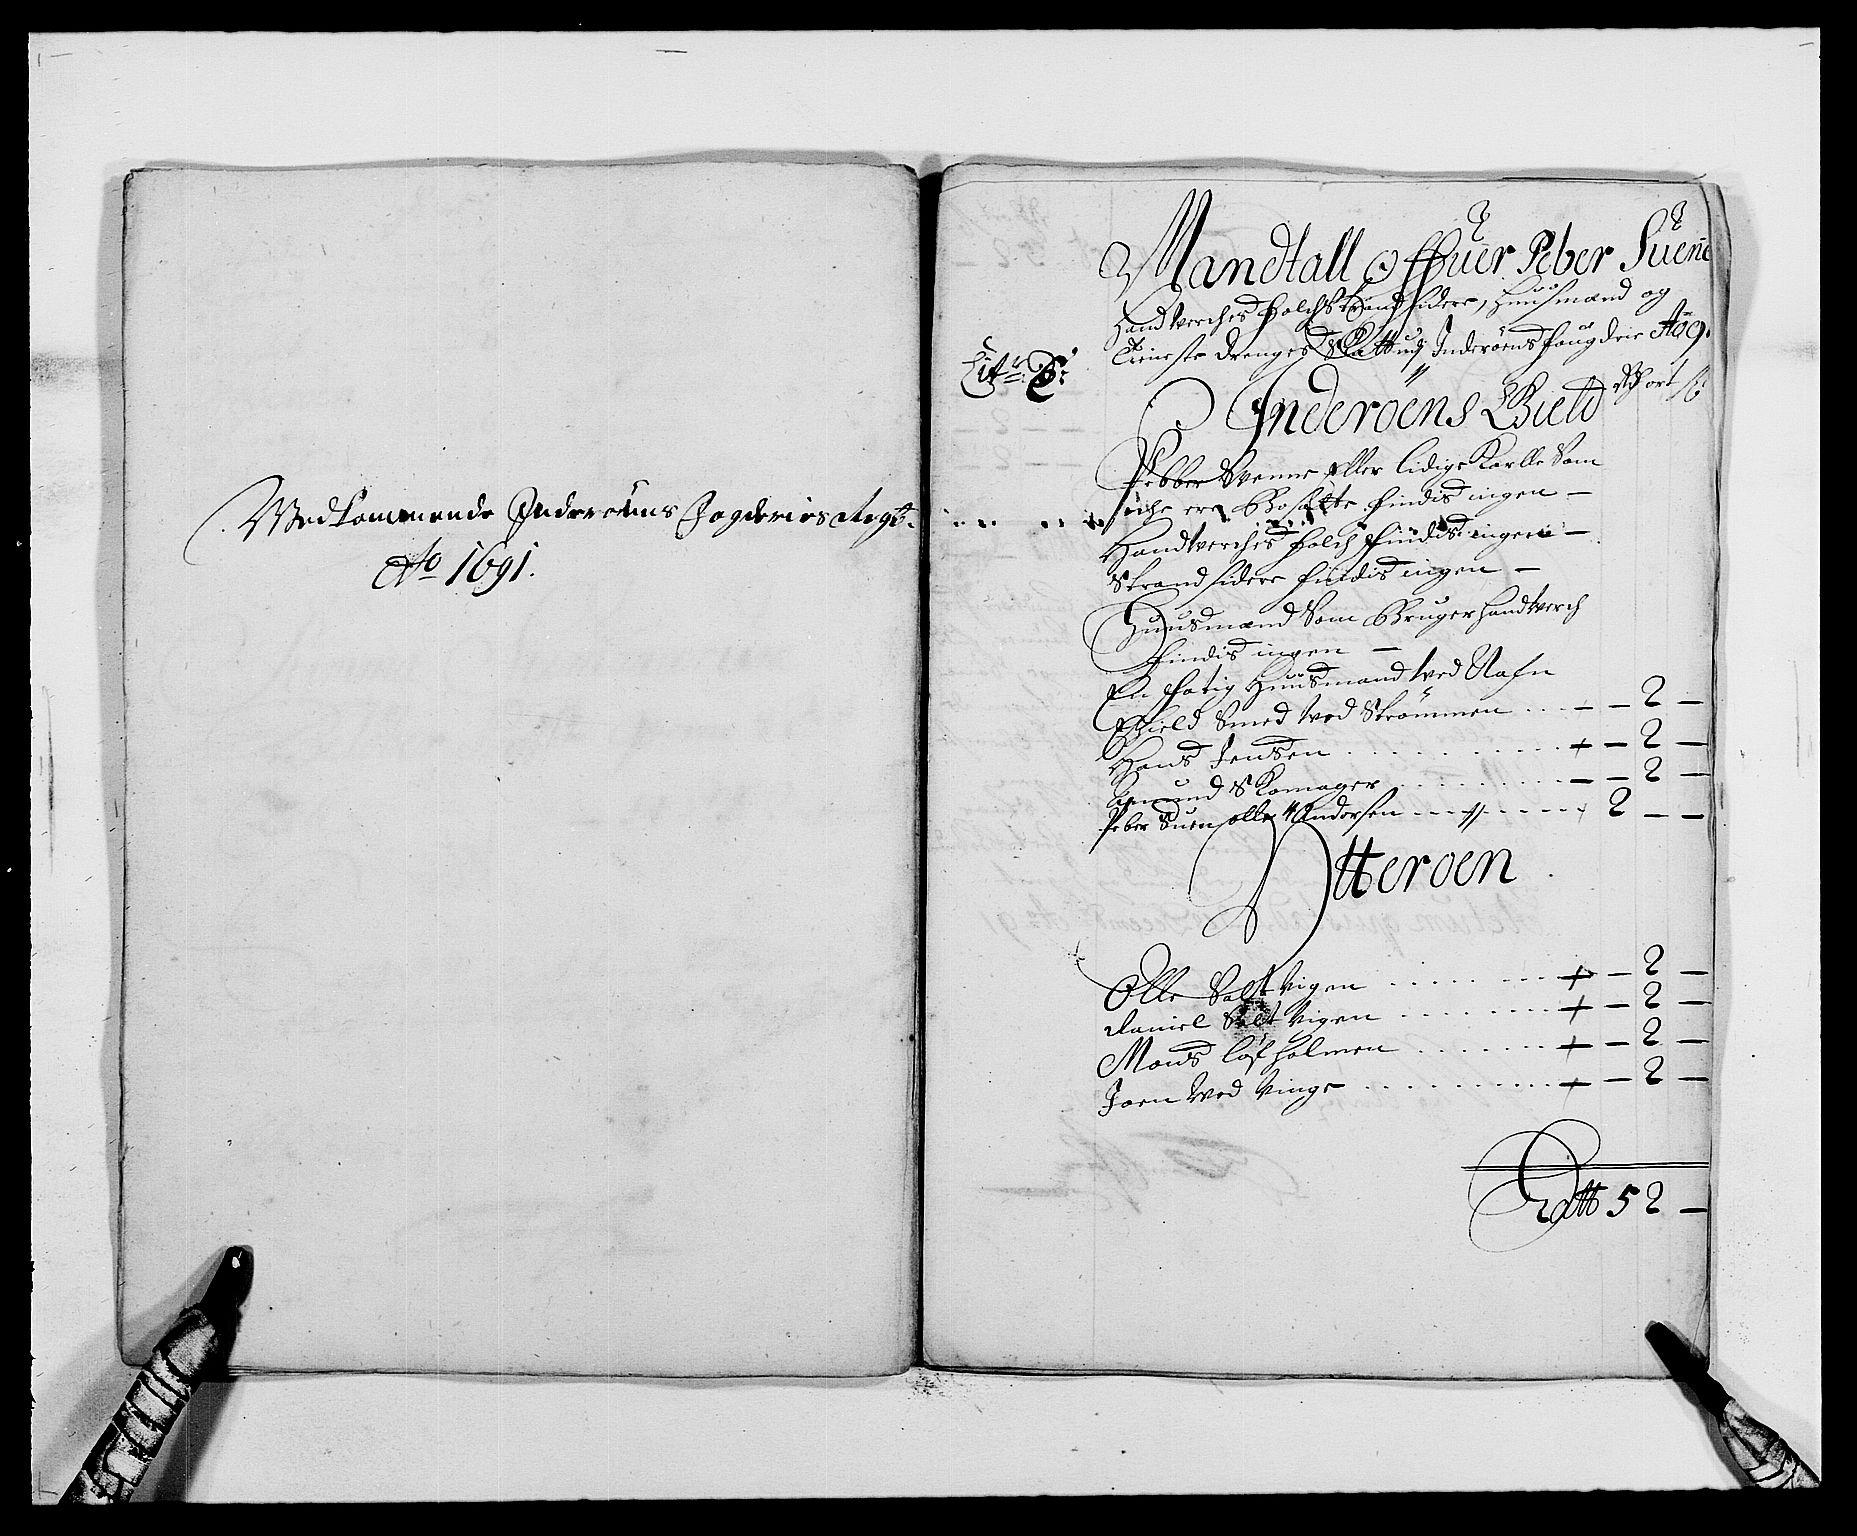 RA, Rentekammeret inntil 1814, Reviderte regnskaper, Fogderegnskap, R63/L4307: Fogderegnskap Inderøy, 1690-1691, s. 302